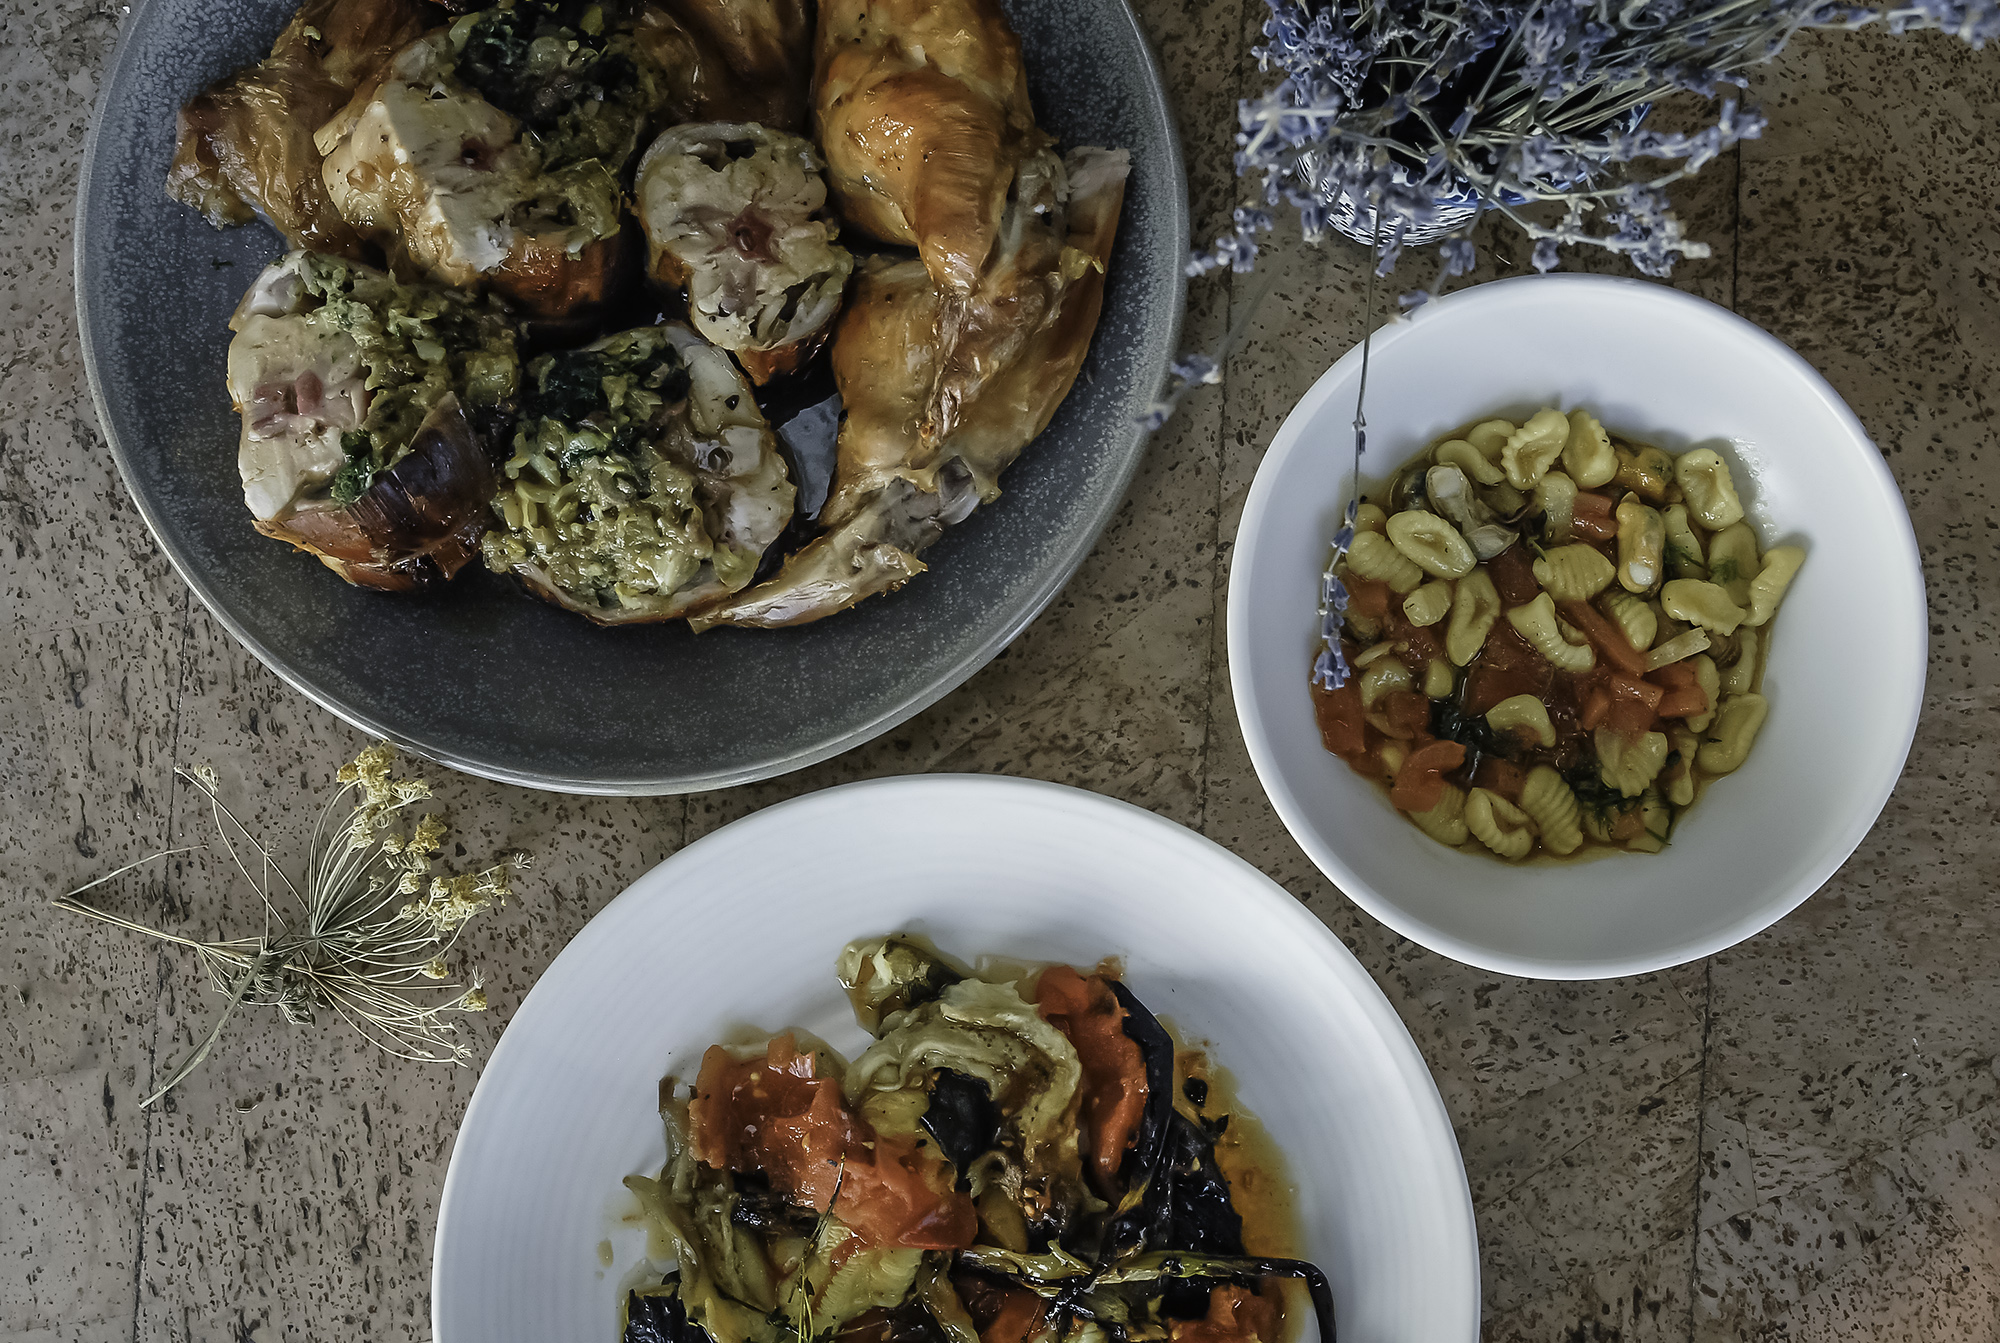 Sardine dishes | Courtesy of Sardine